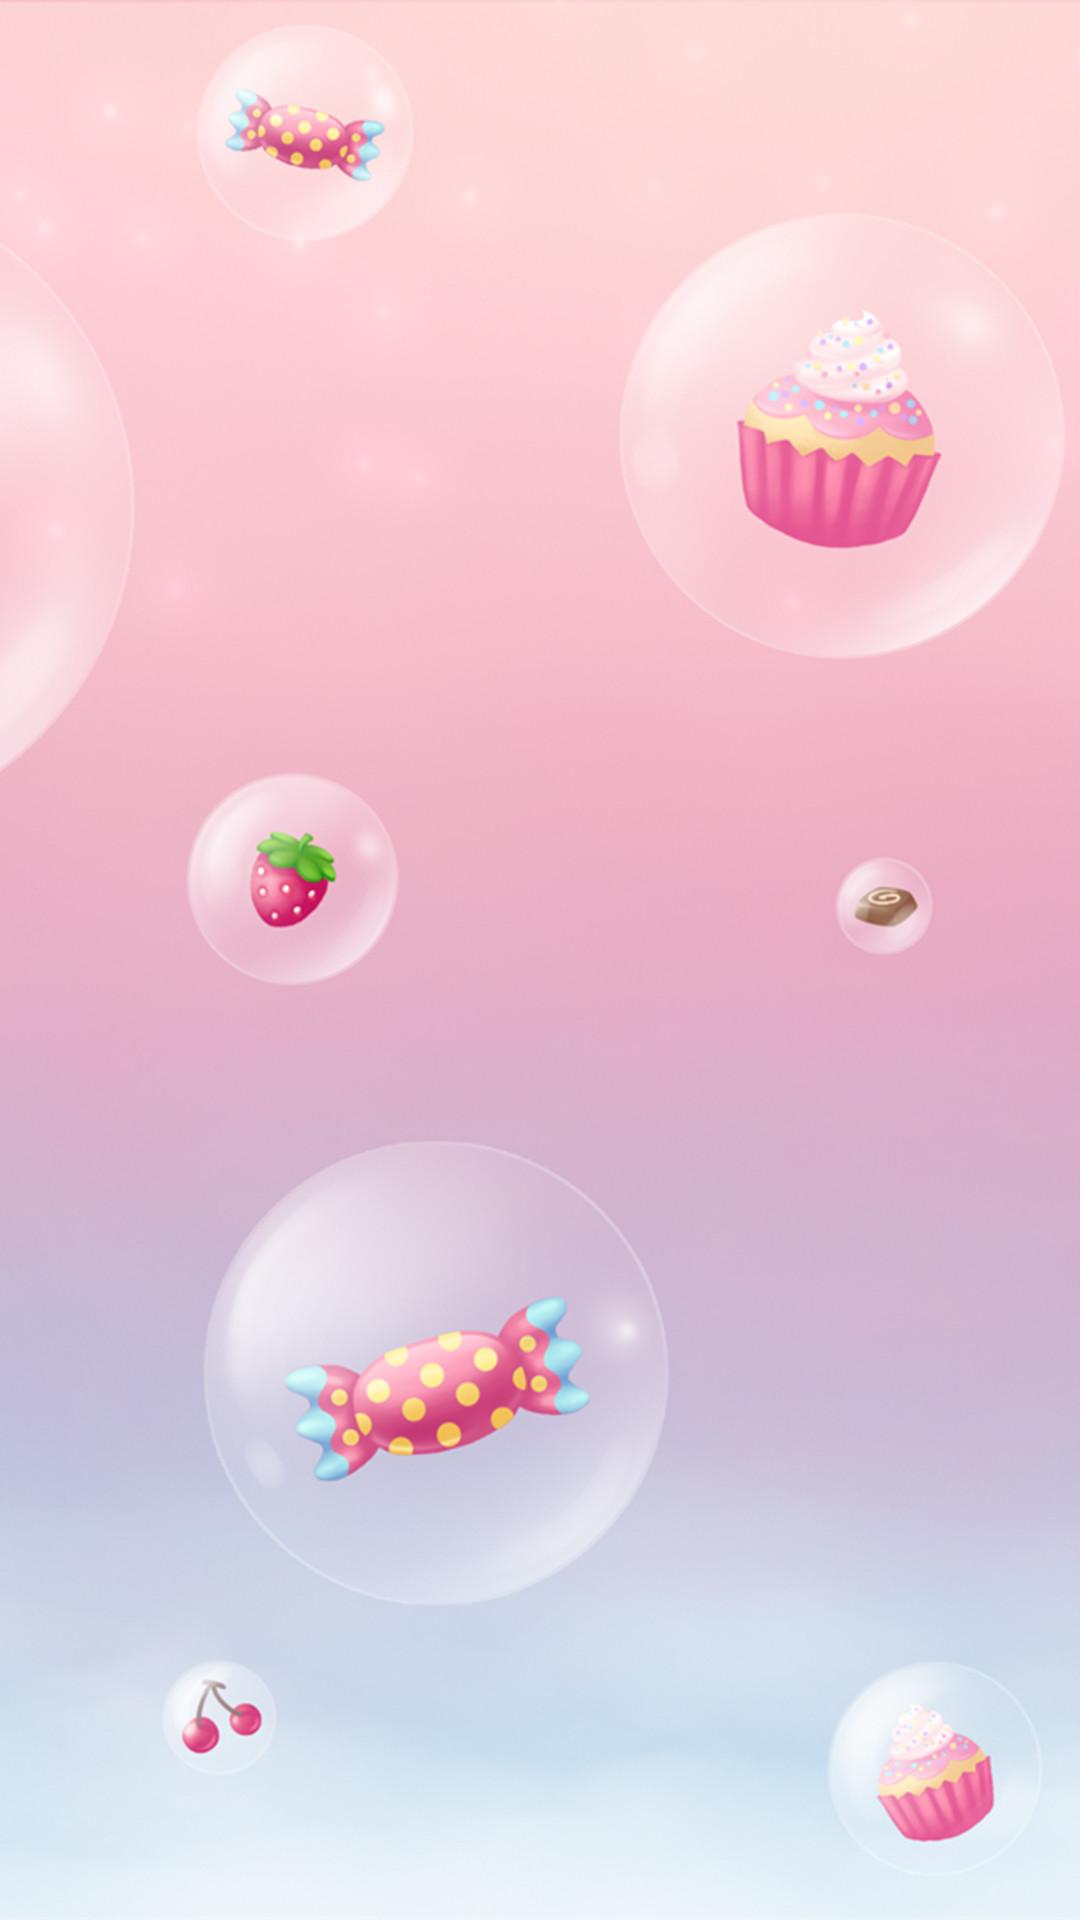 Girly cute iPhone6s wallpaper : cupcakes · Walpaper IphoneIphone  WallpaperPink …